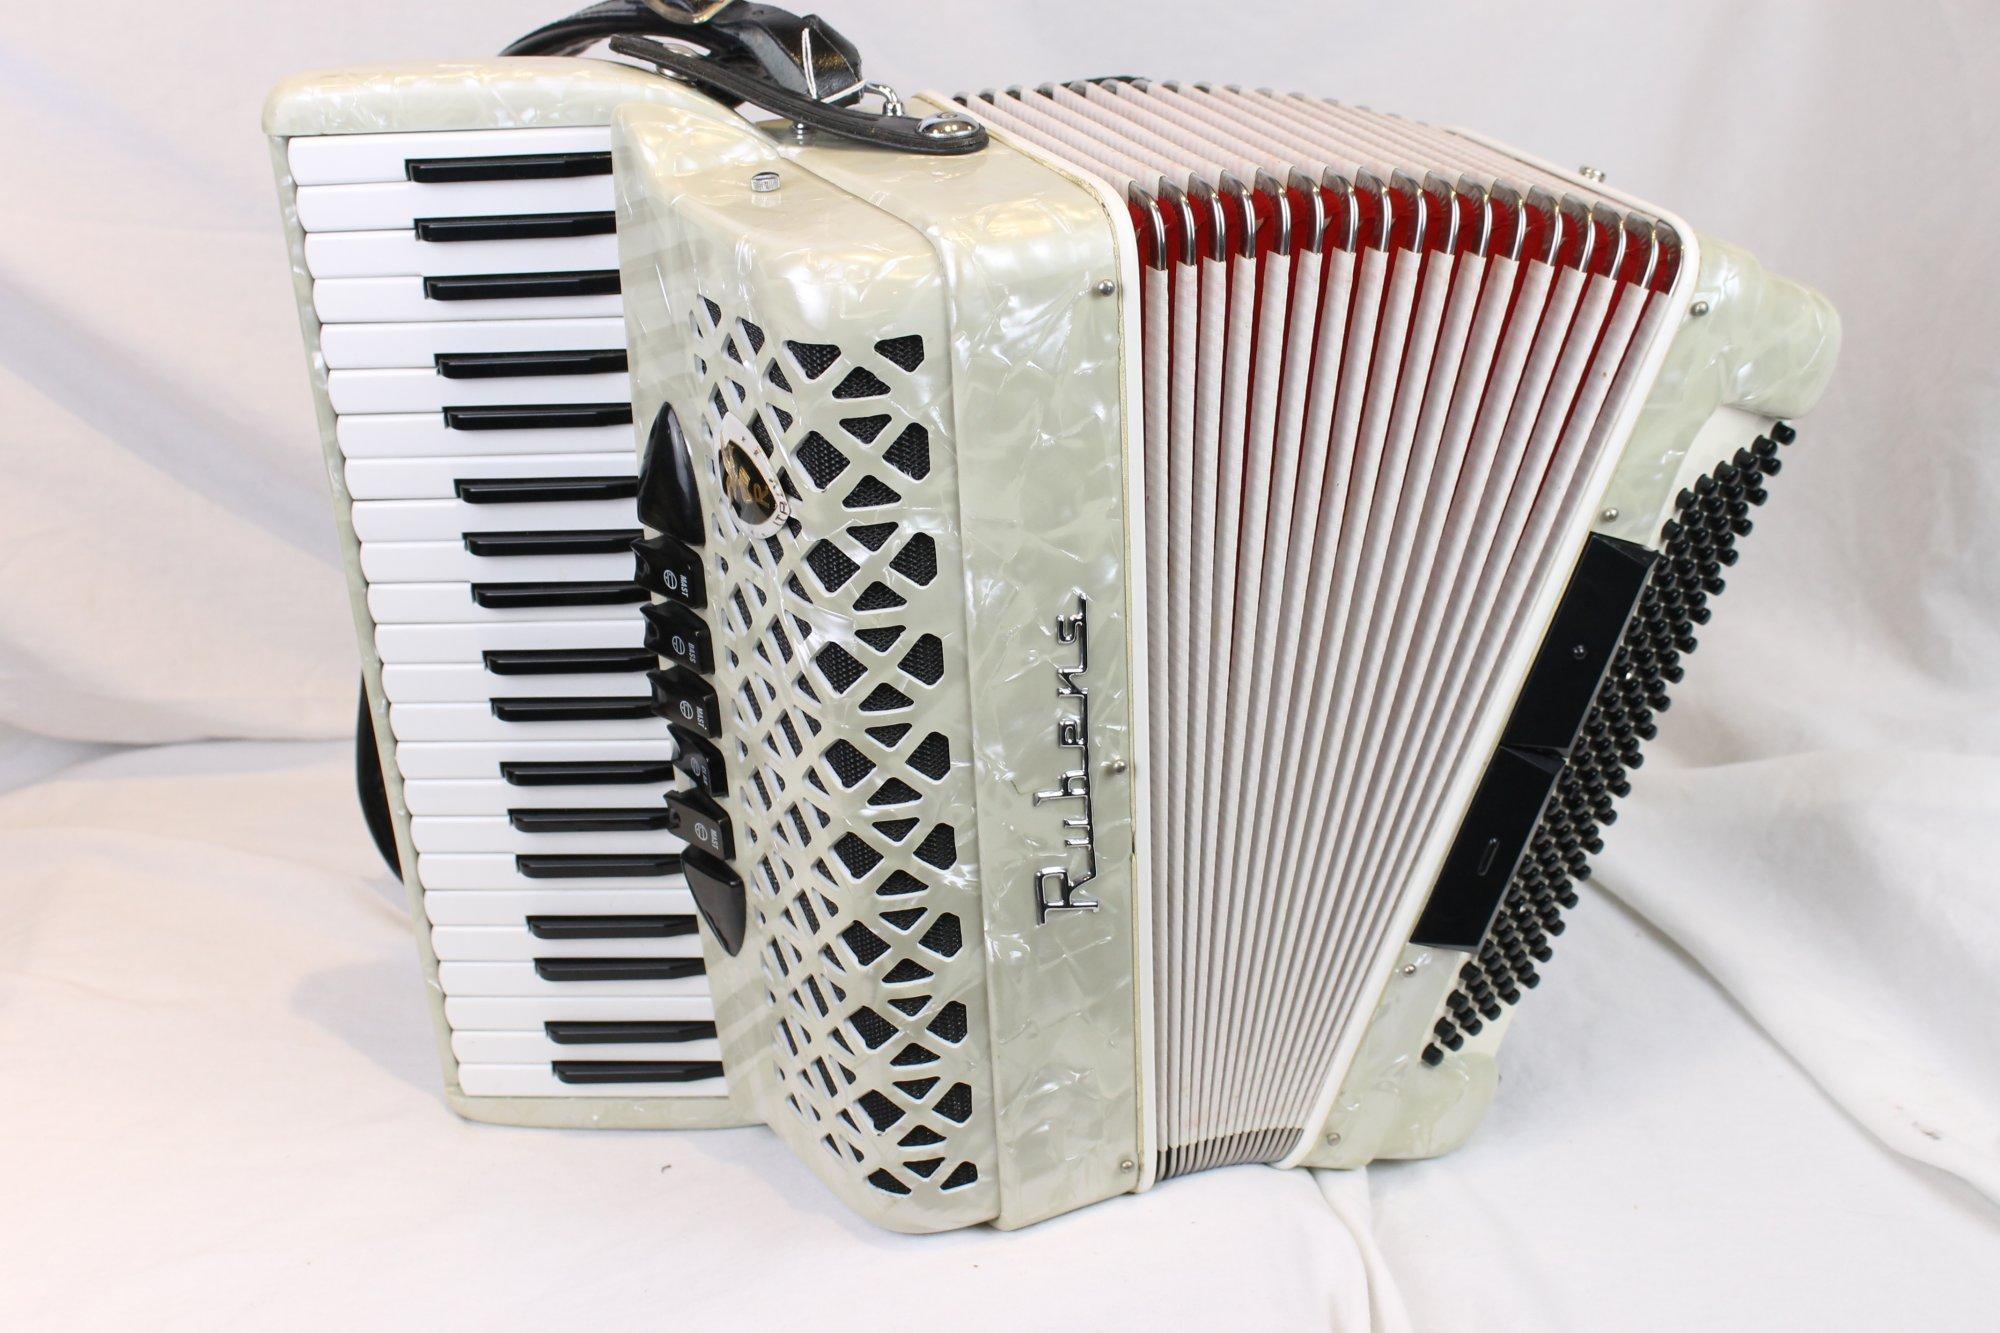 3542 - White Rubens Piano Accordion LM 41 120